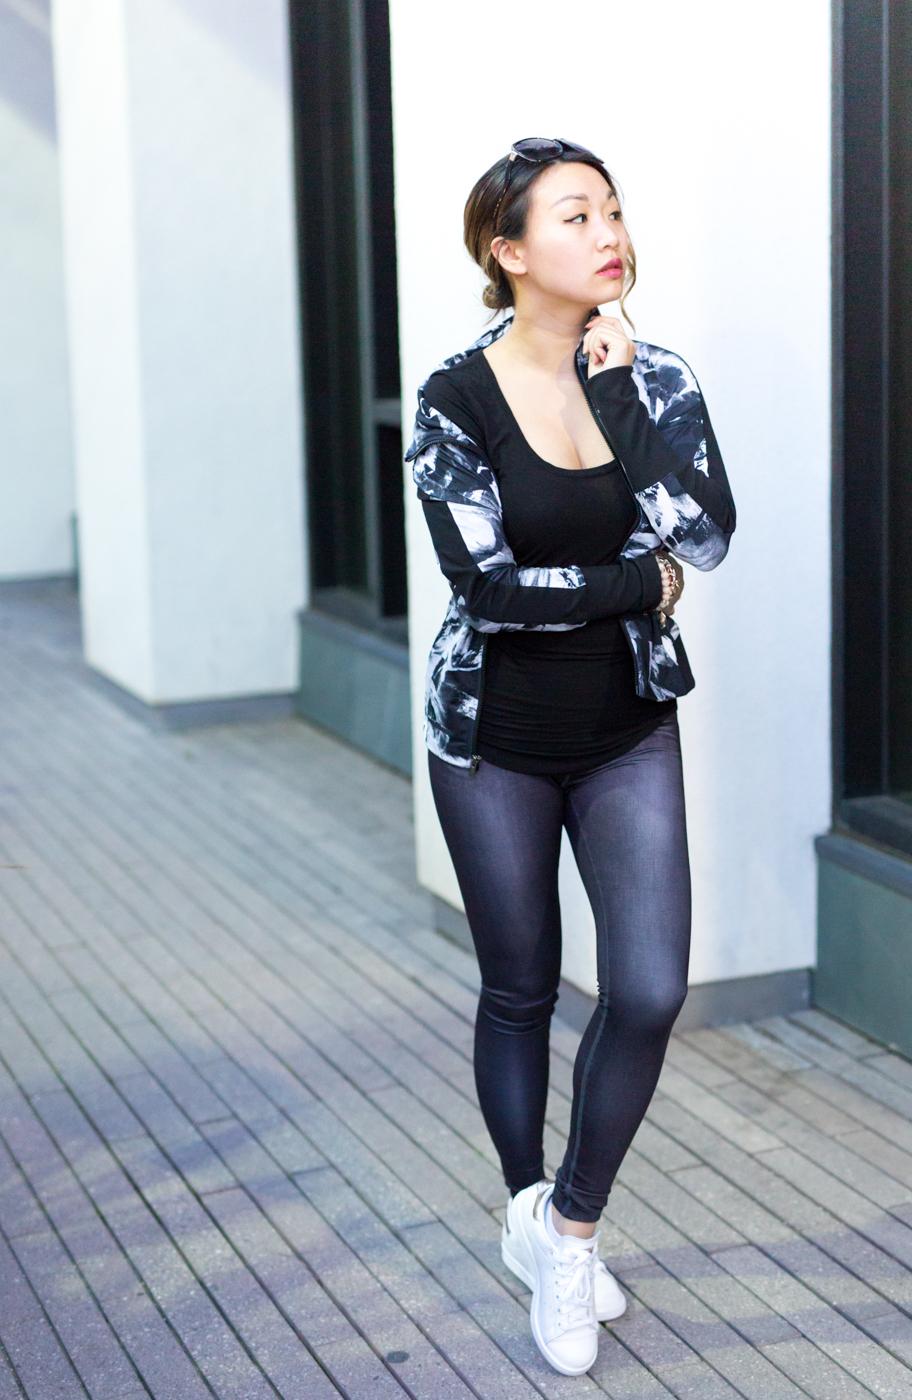 lucy indiGO Run Tights | The Chic Diary